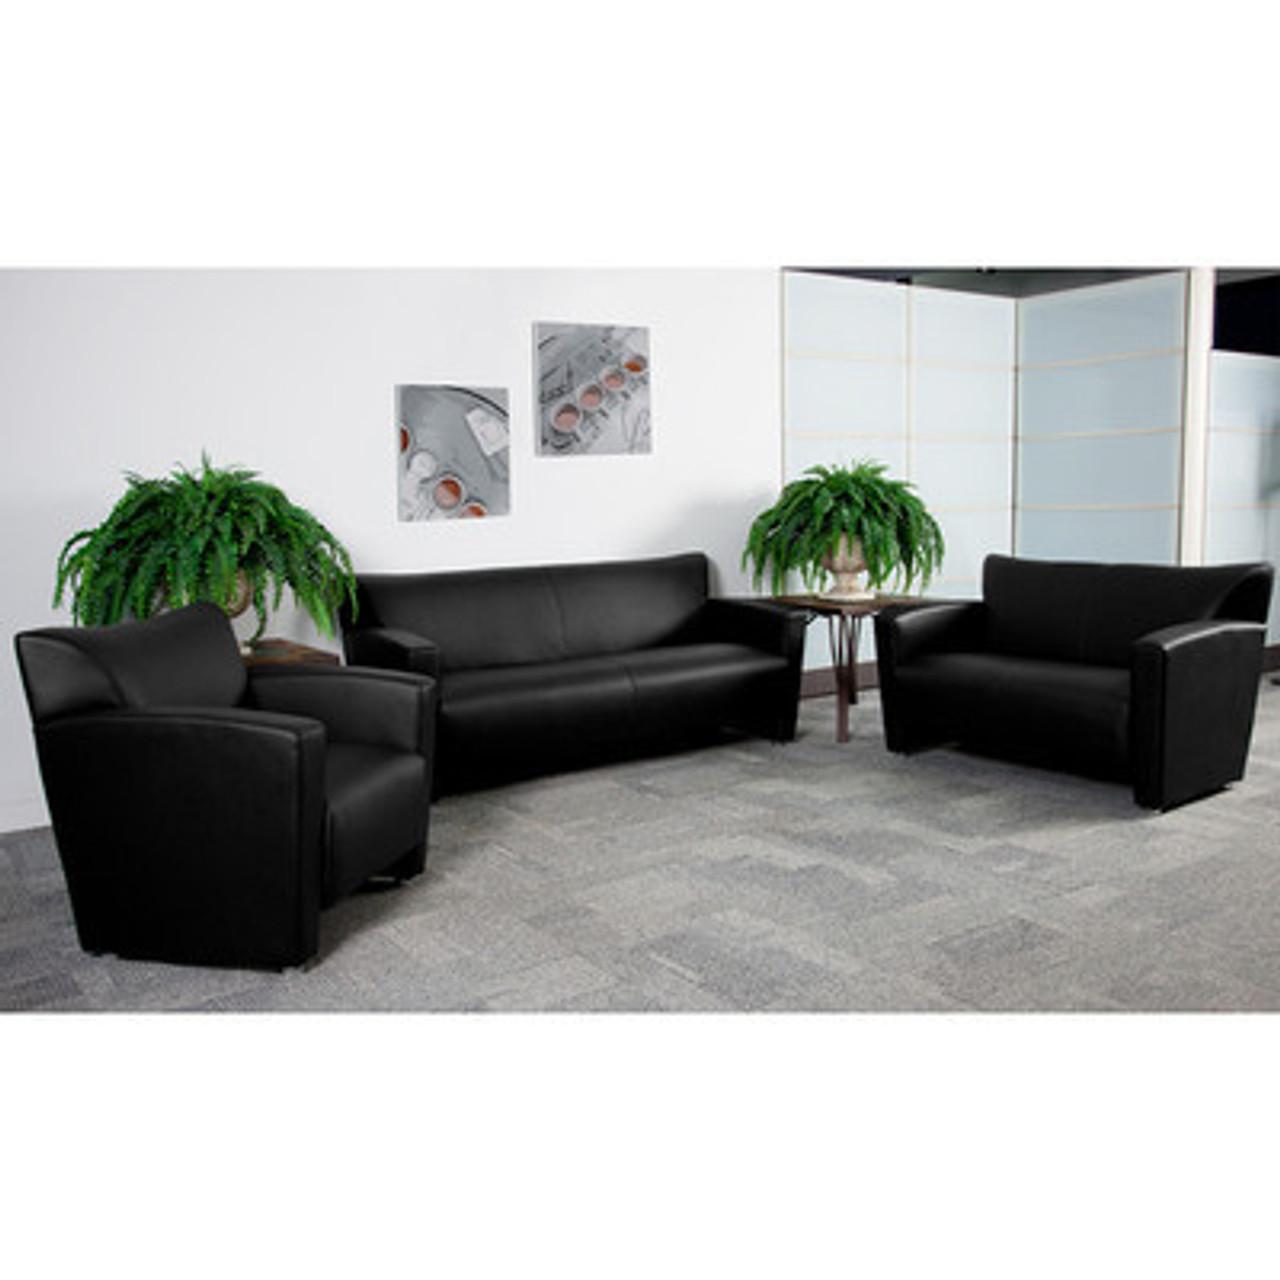 3pc Modern Leather Office Reception Sofa Set, FF-0428-12-S1